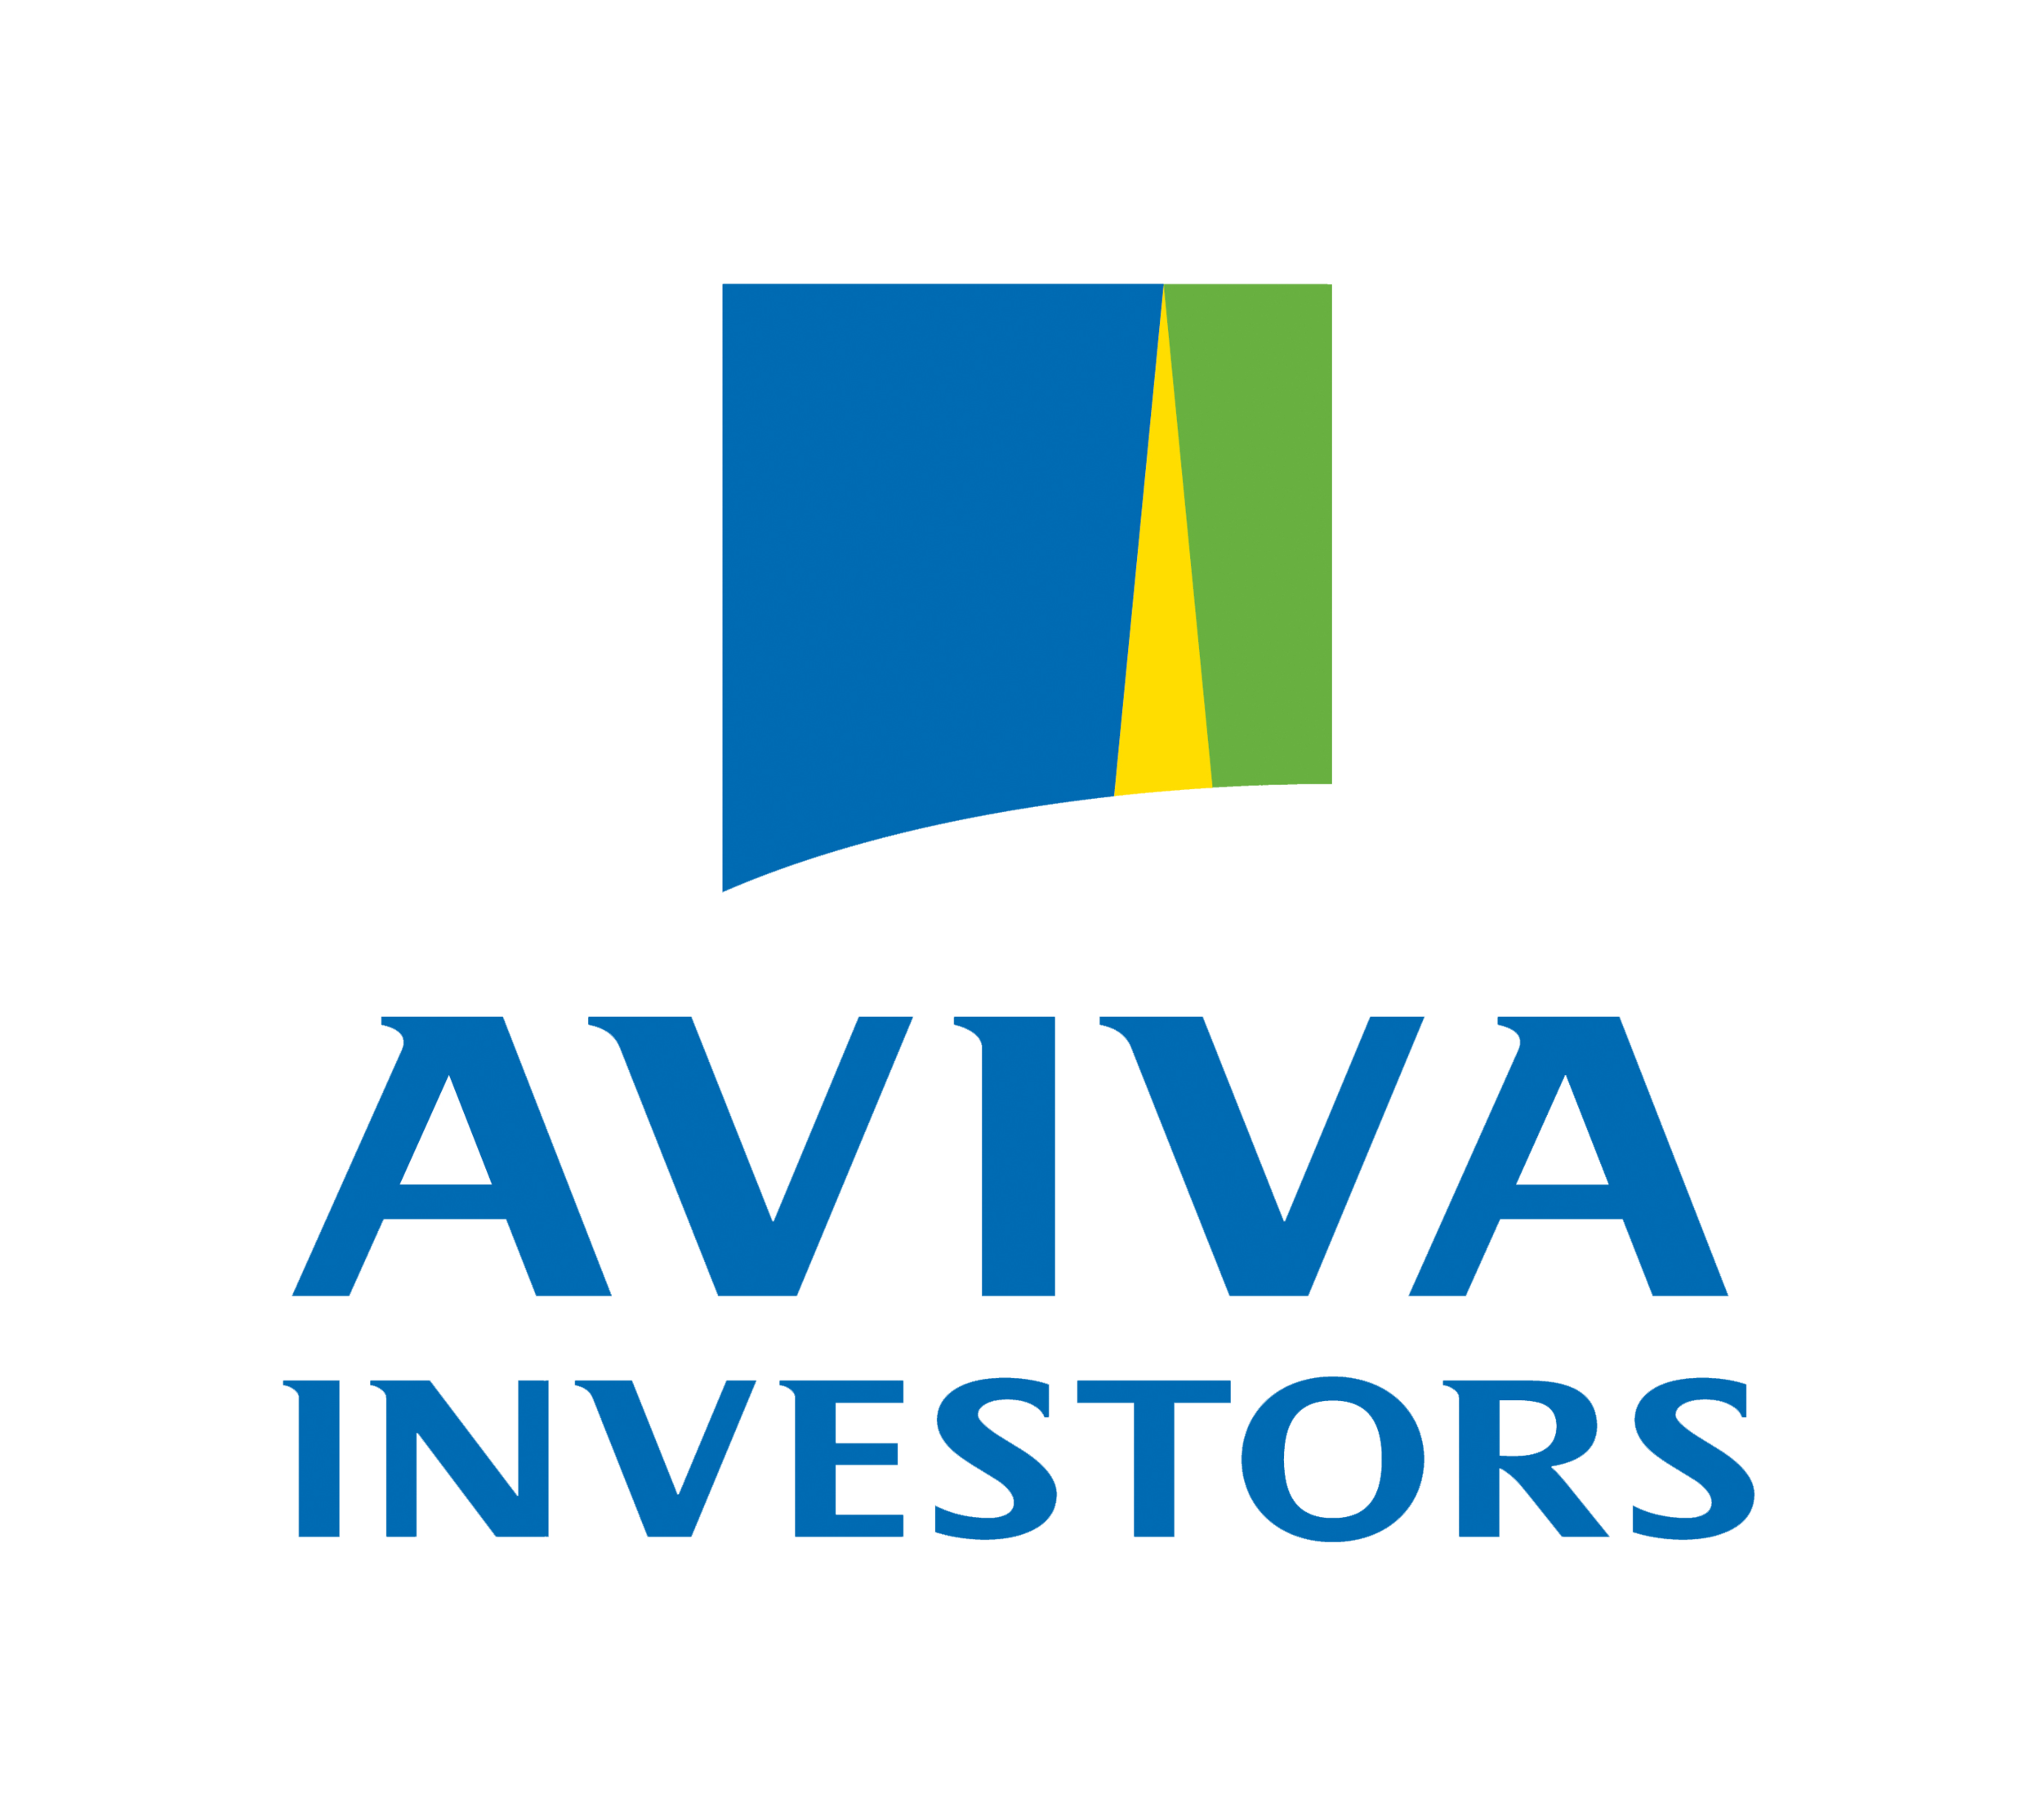 Aviva_Investors_RGB.png